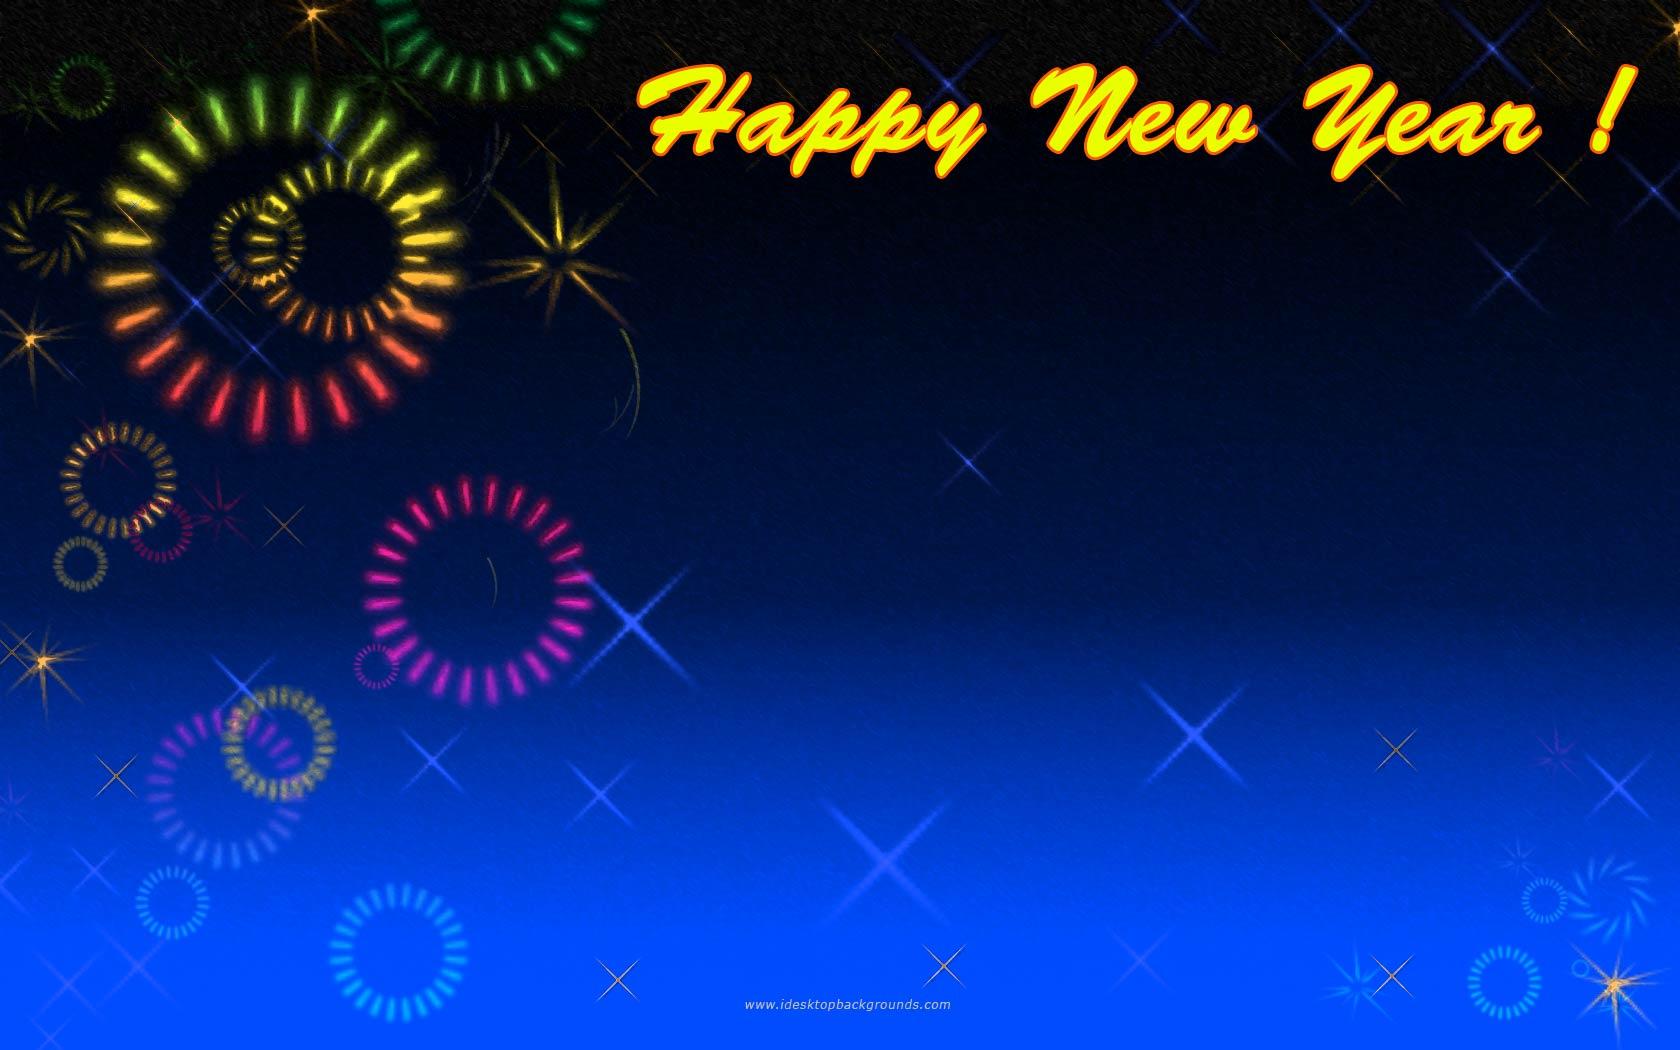 Rajesh 3d Wallpaper Download New Year Background High Definition Wallpaper 16423 Baltana